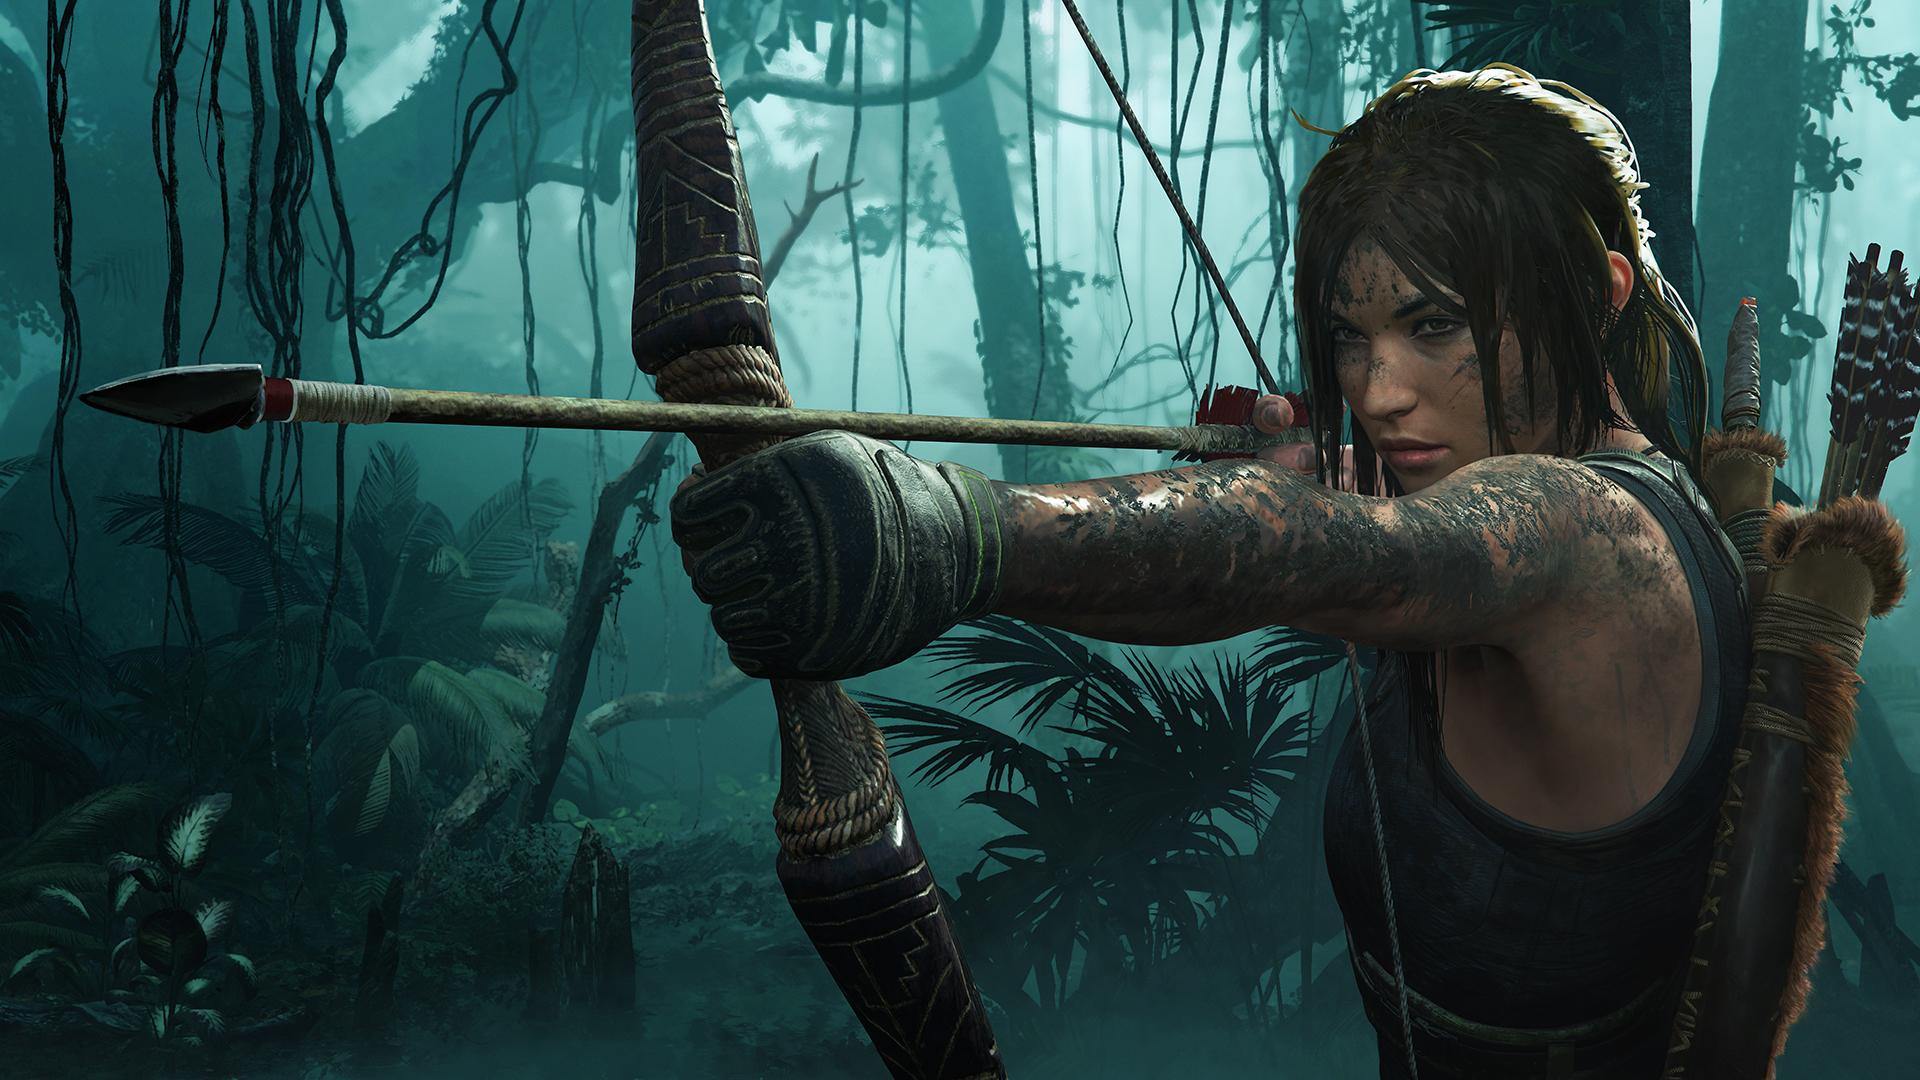 Shadow Of The Tomb Raider Lara Croft Key Art Hd Wallpaper